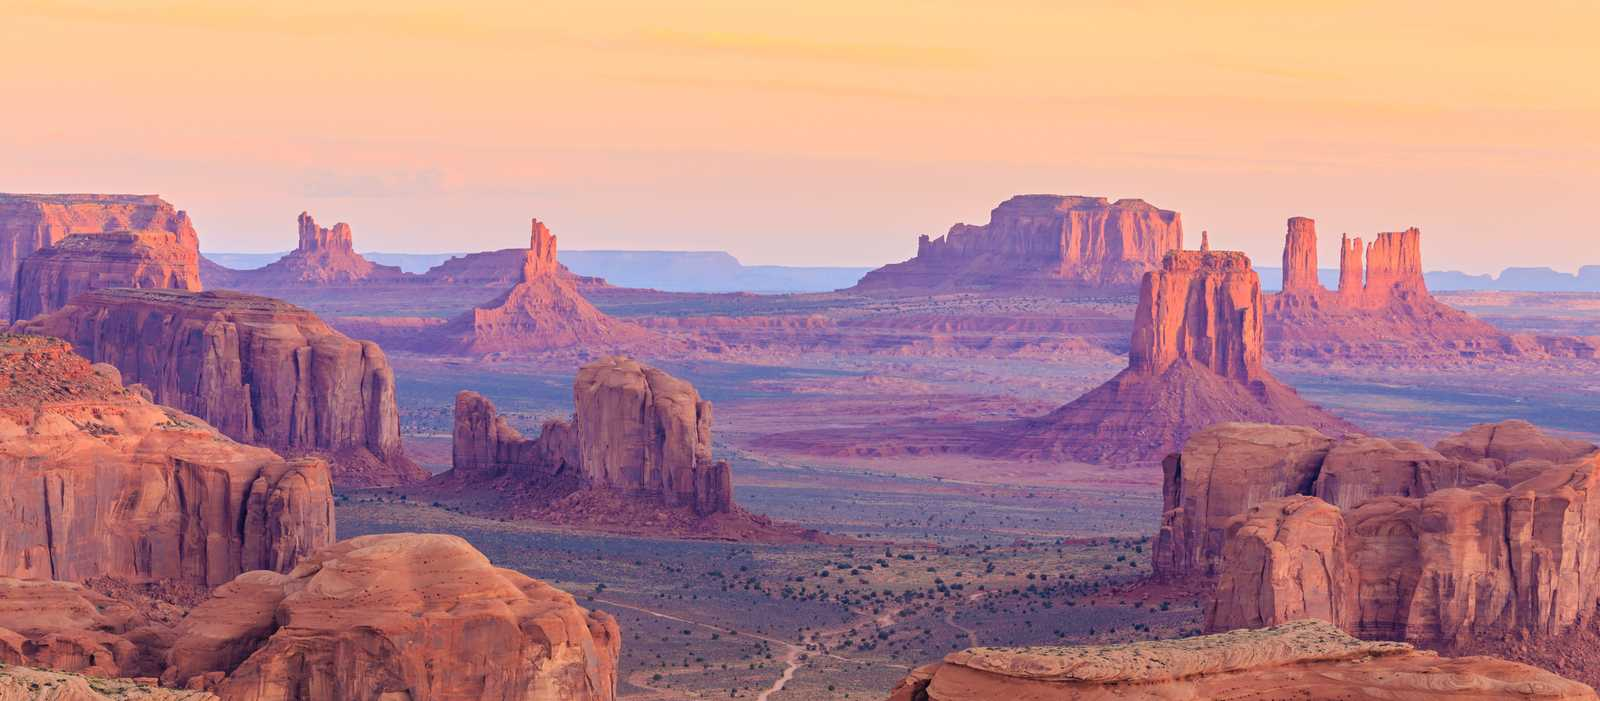 Sonnenuntergang im Monument Valley, Arizona